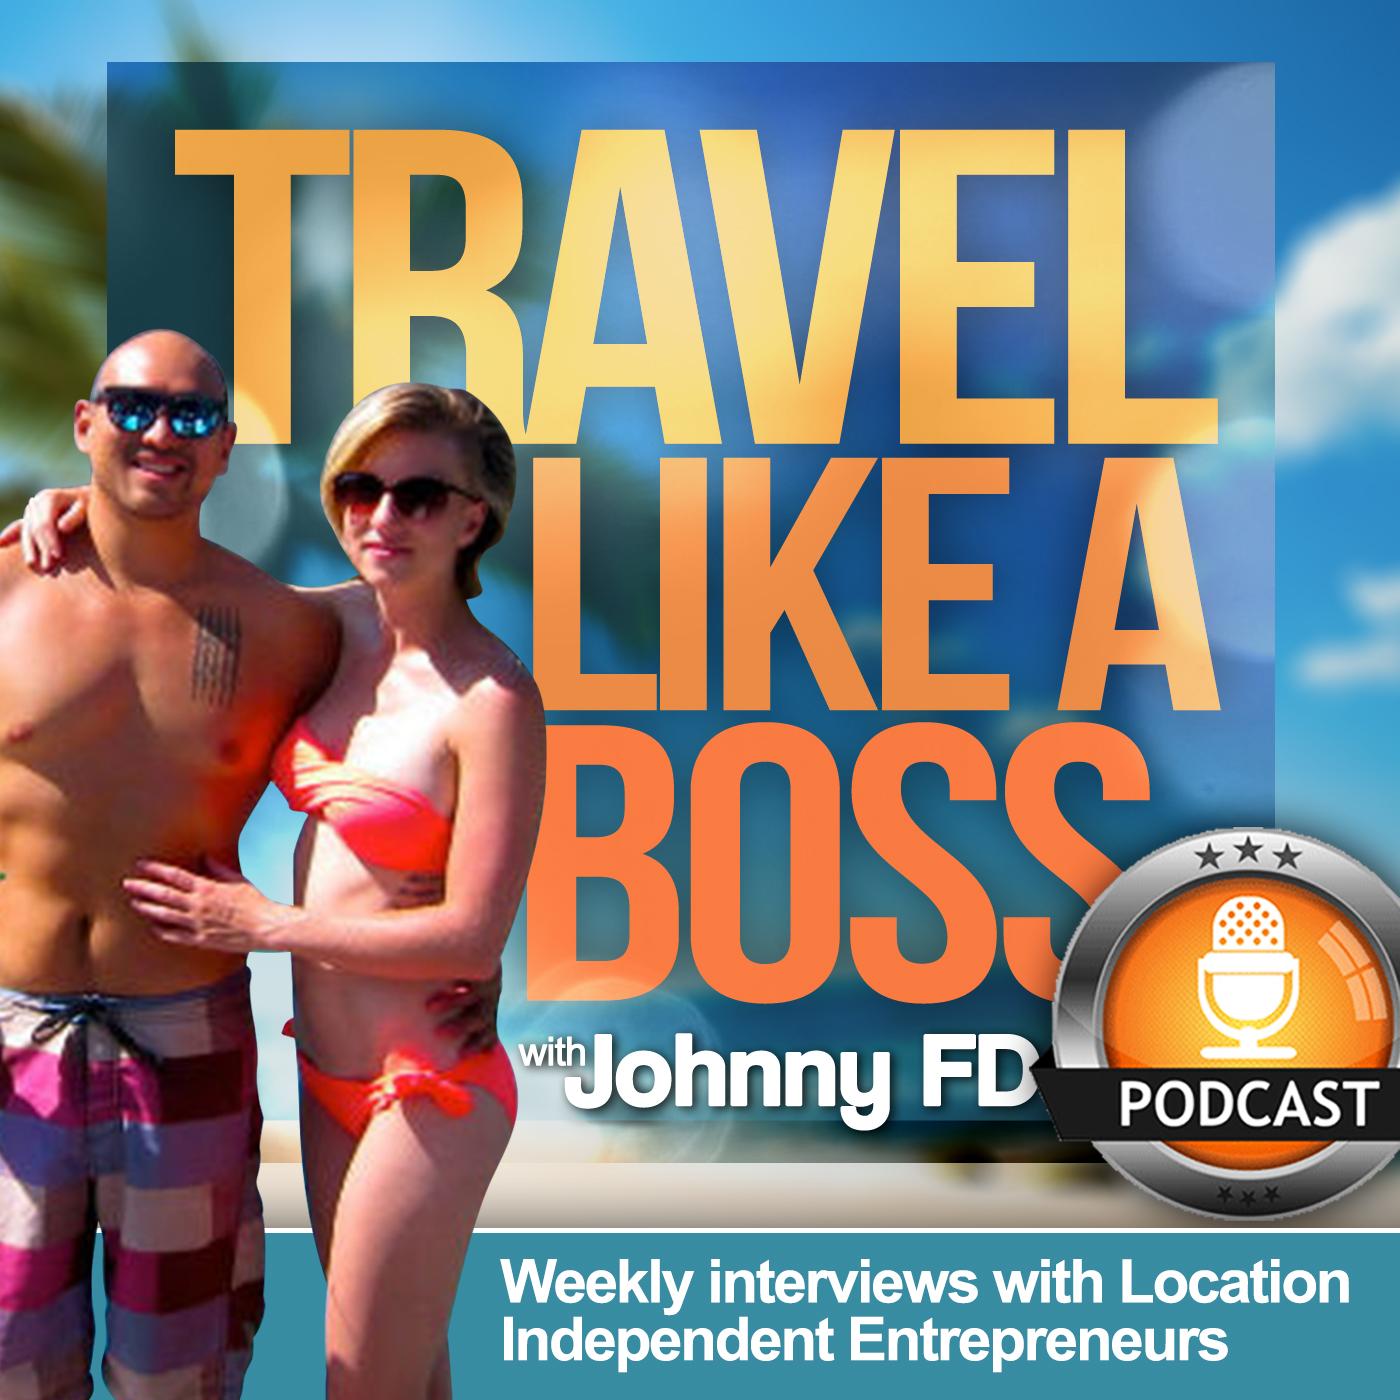 Travel Like a Boss Podcast show art